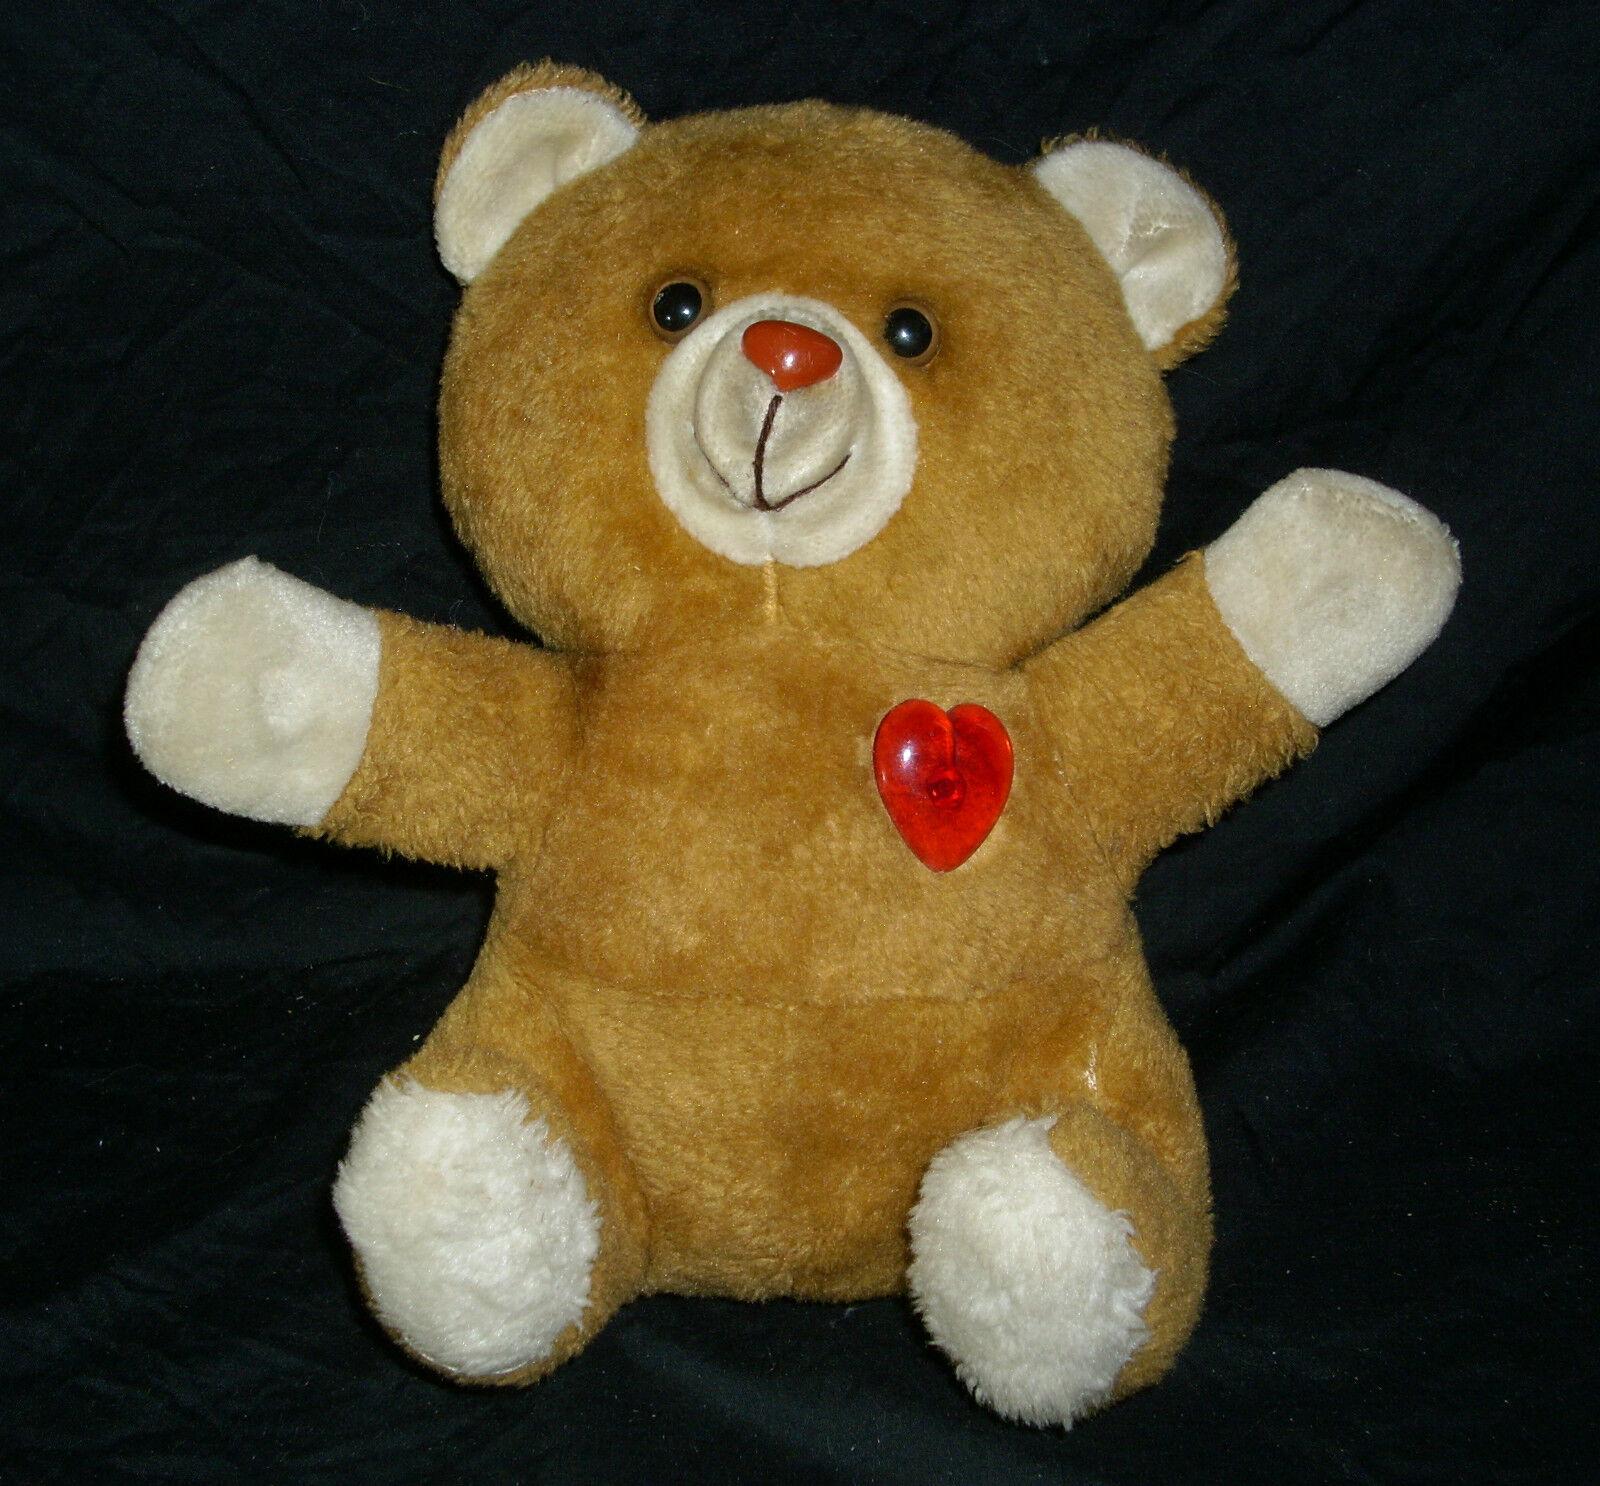 VINTAGE LULLABY STUFFED ANIMAL PLUSH BROWN TEDDY BEAR ELECTRONIC MUSICAL SONGS